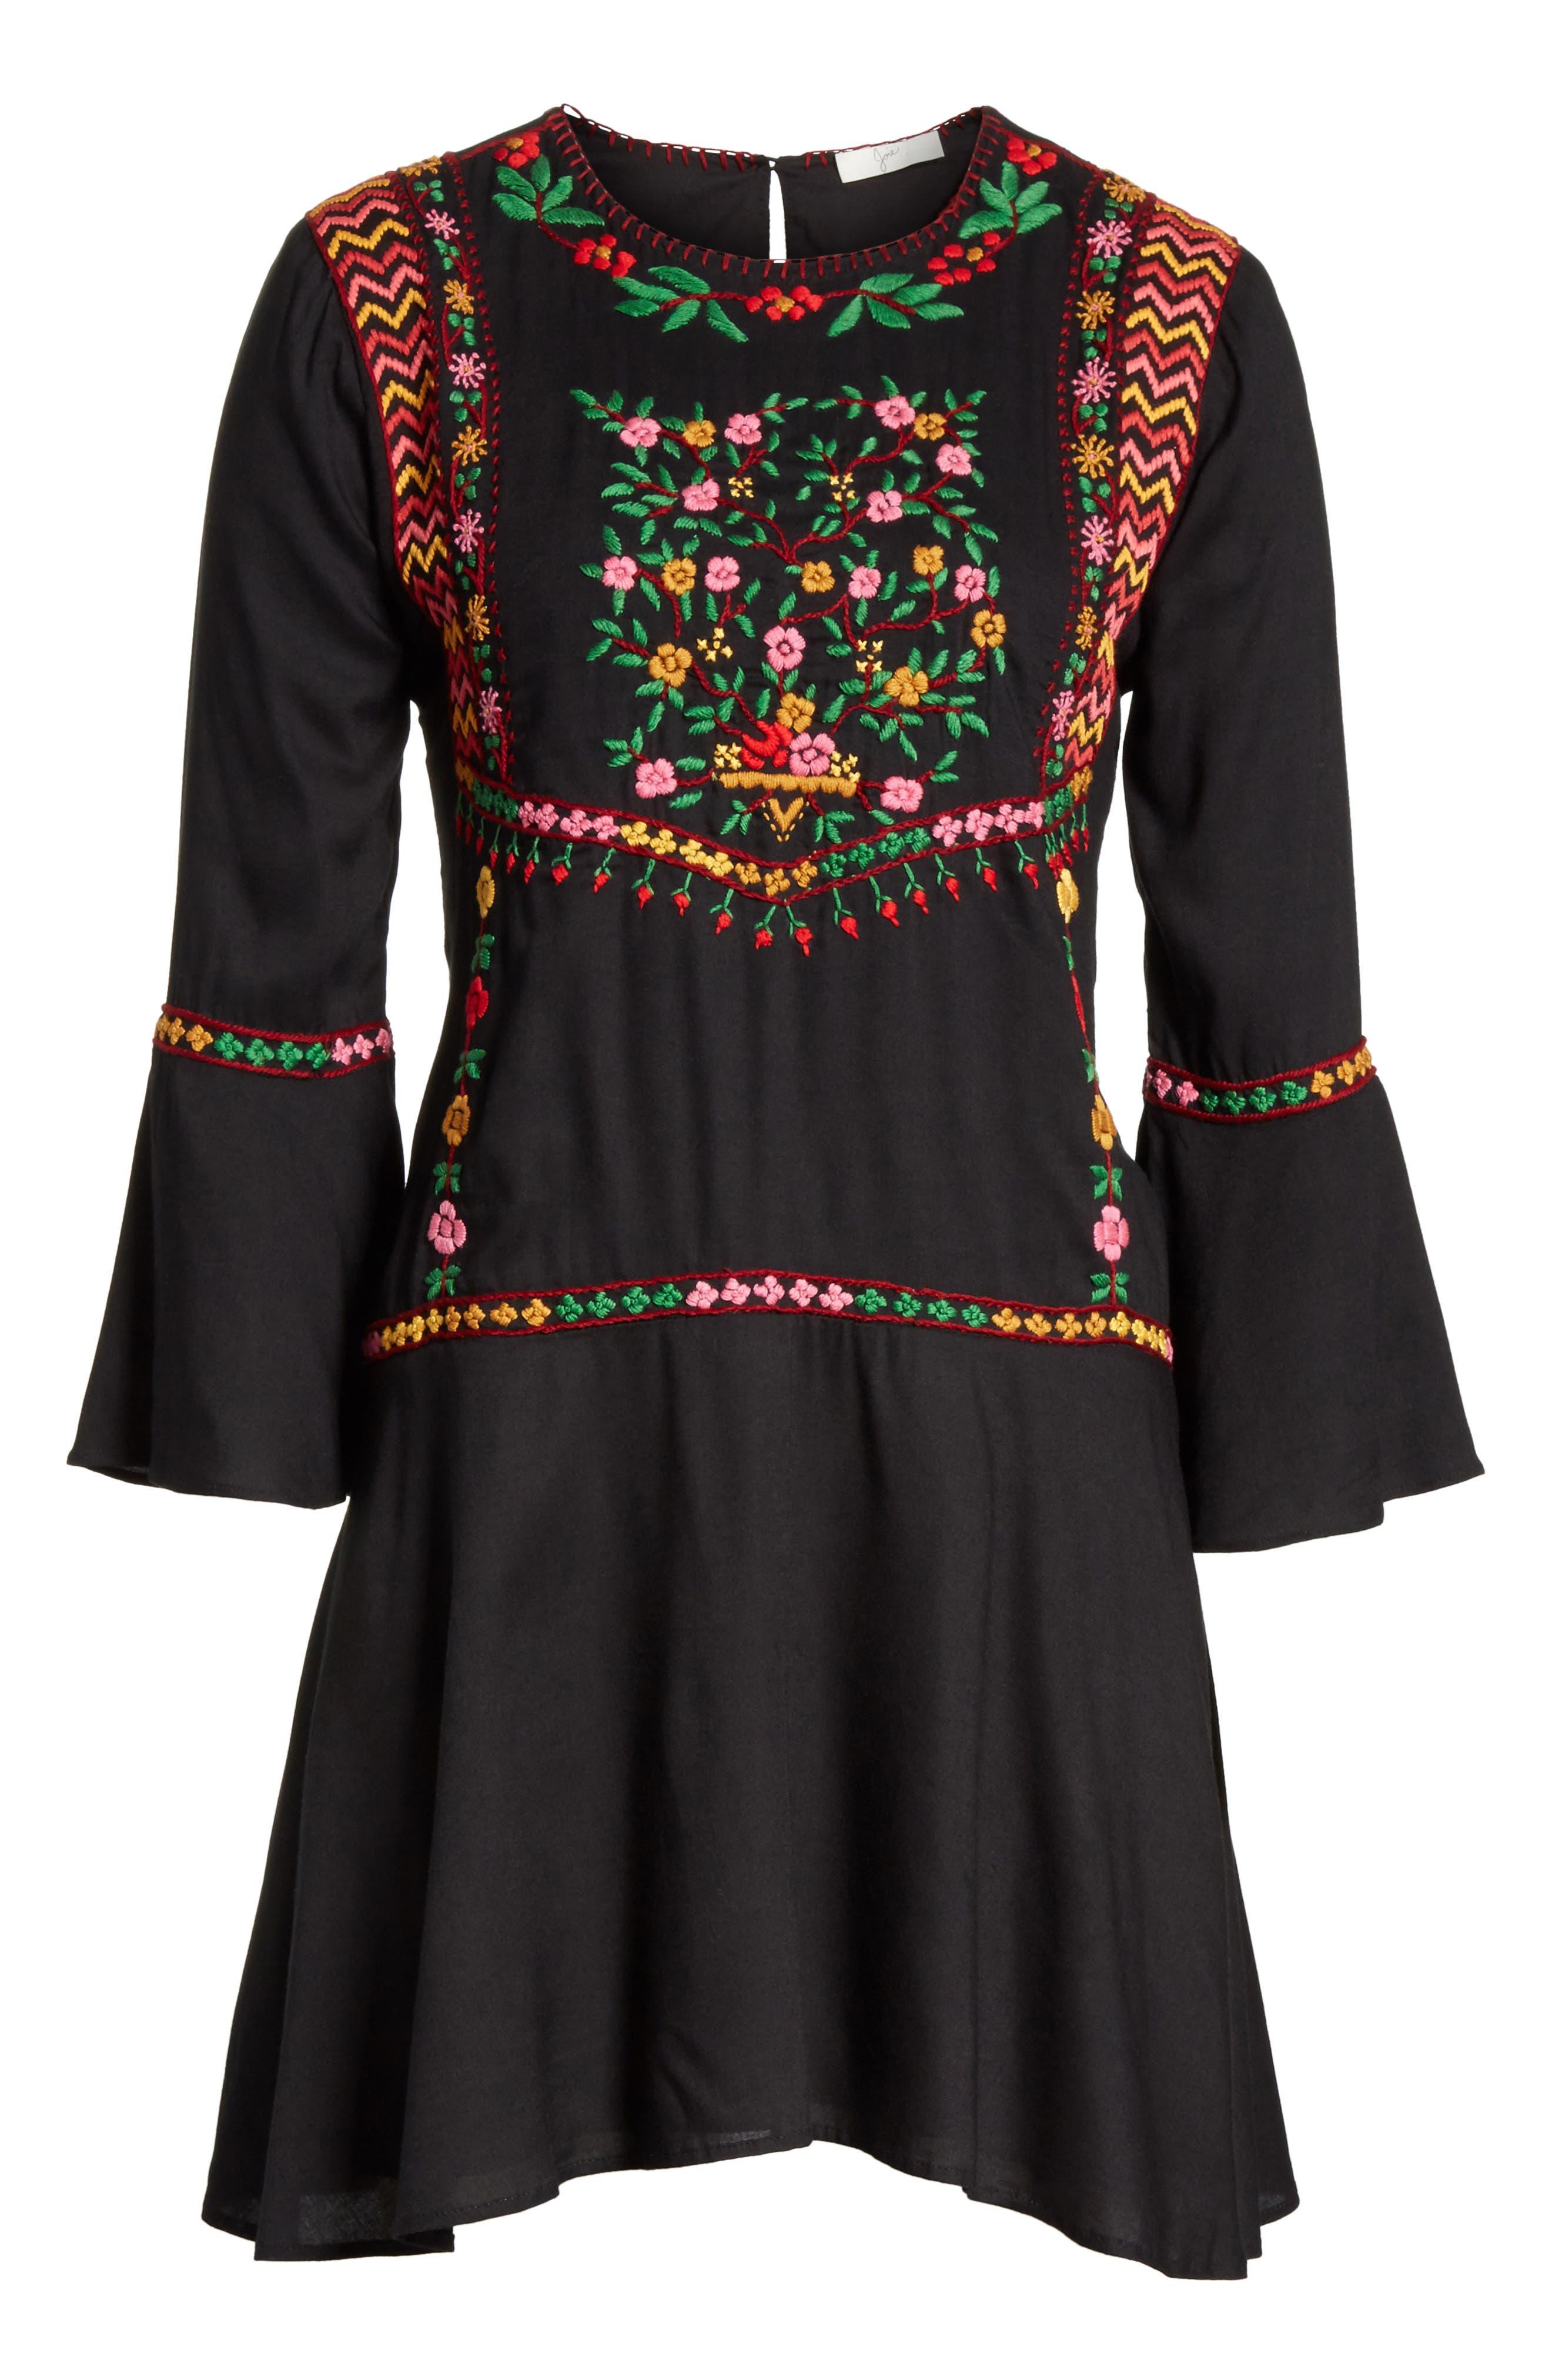 Gosinda Embroidered Dress,                             Alternate thumbnail 6, color,                             Caviar/ Multi